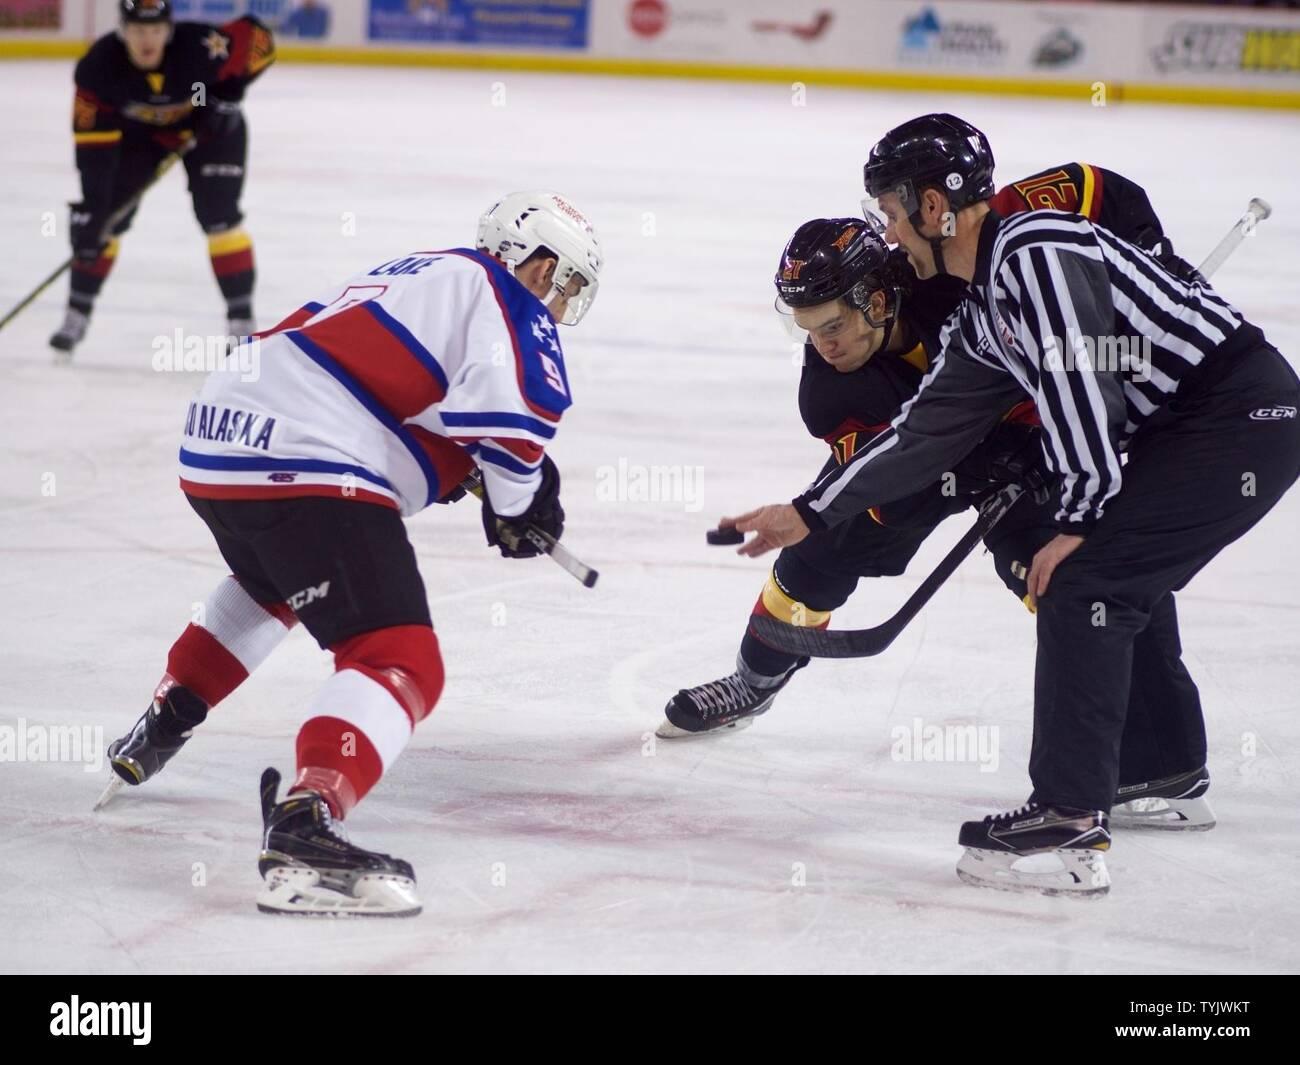 Alaska Aces forward Ben Lake faces off with Indianapolis